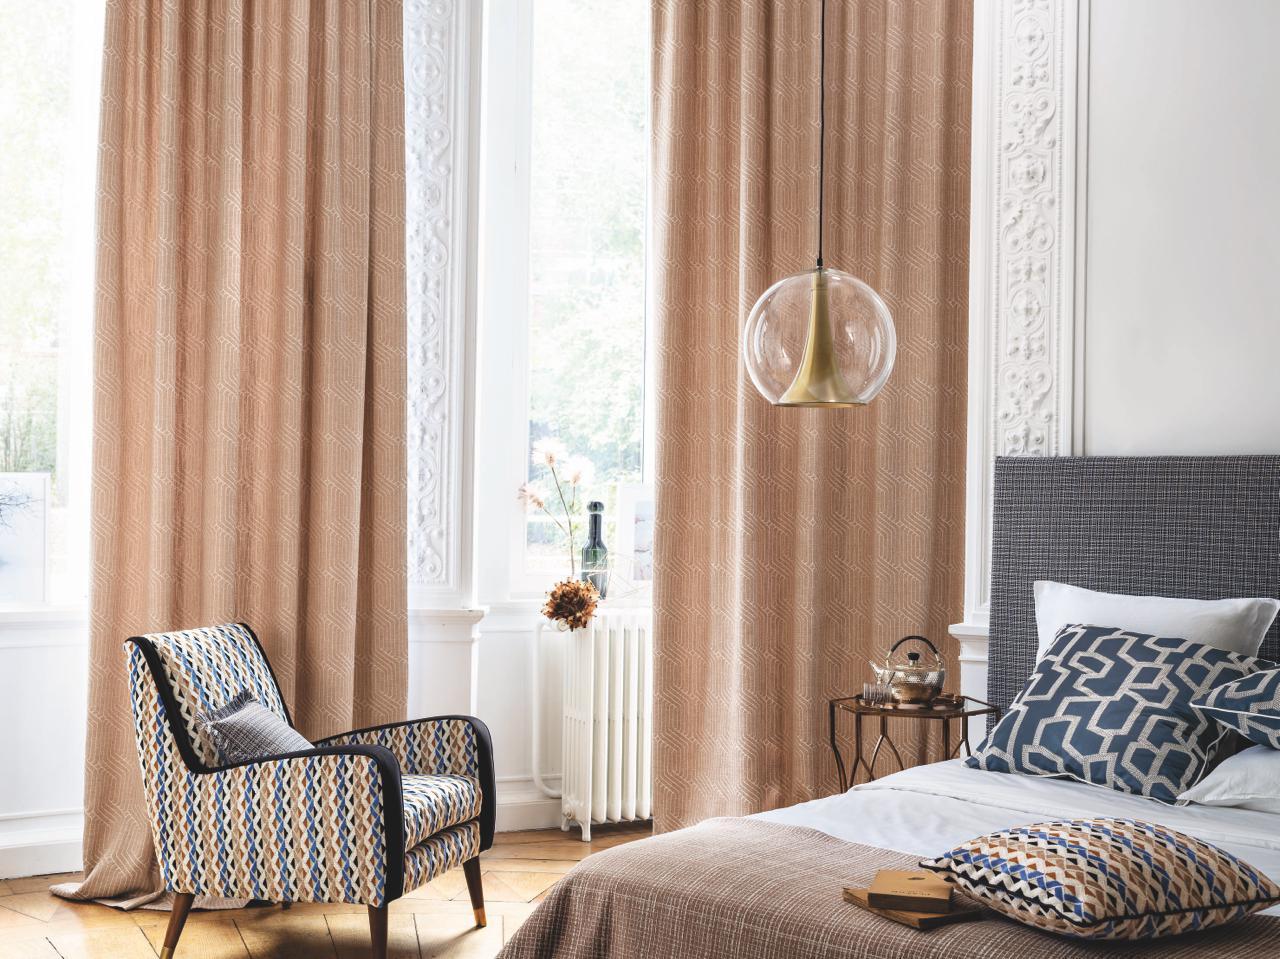 stoff-beige-schlafzimmer-camengo-decohome.de_